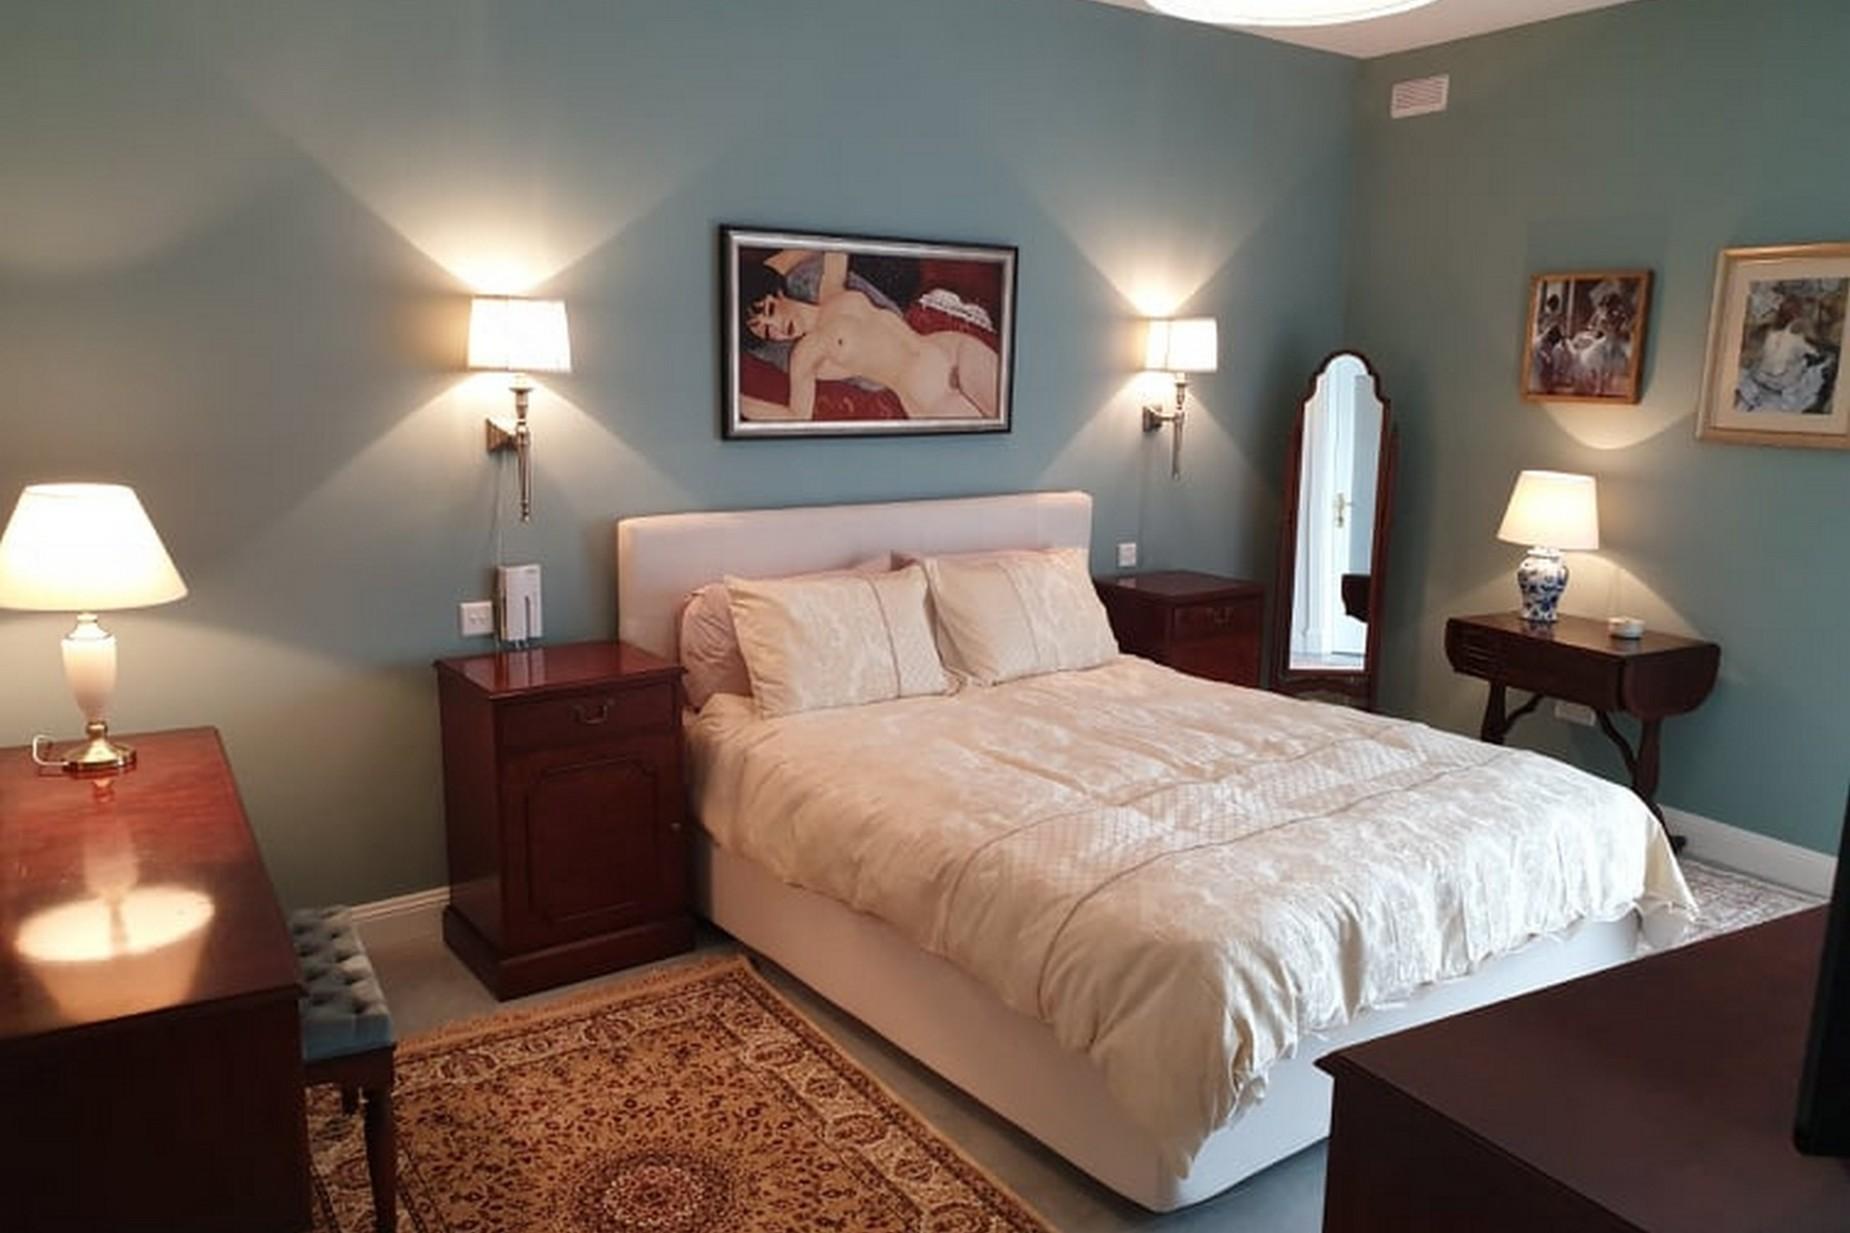 3 bed Apartment For Rent in Birkirkara, Birkirkara - thumb 24